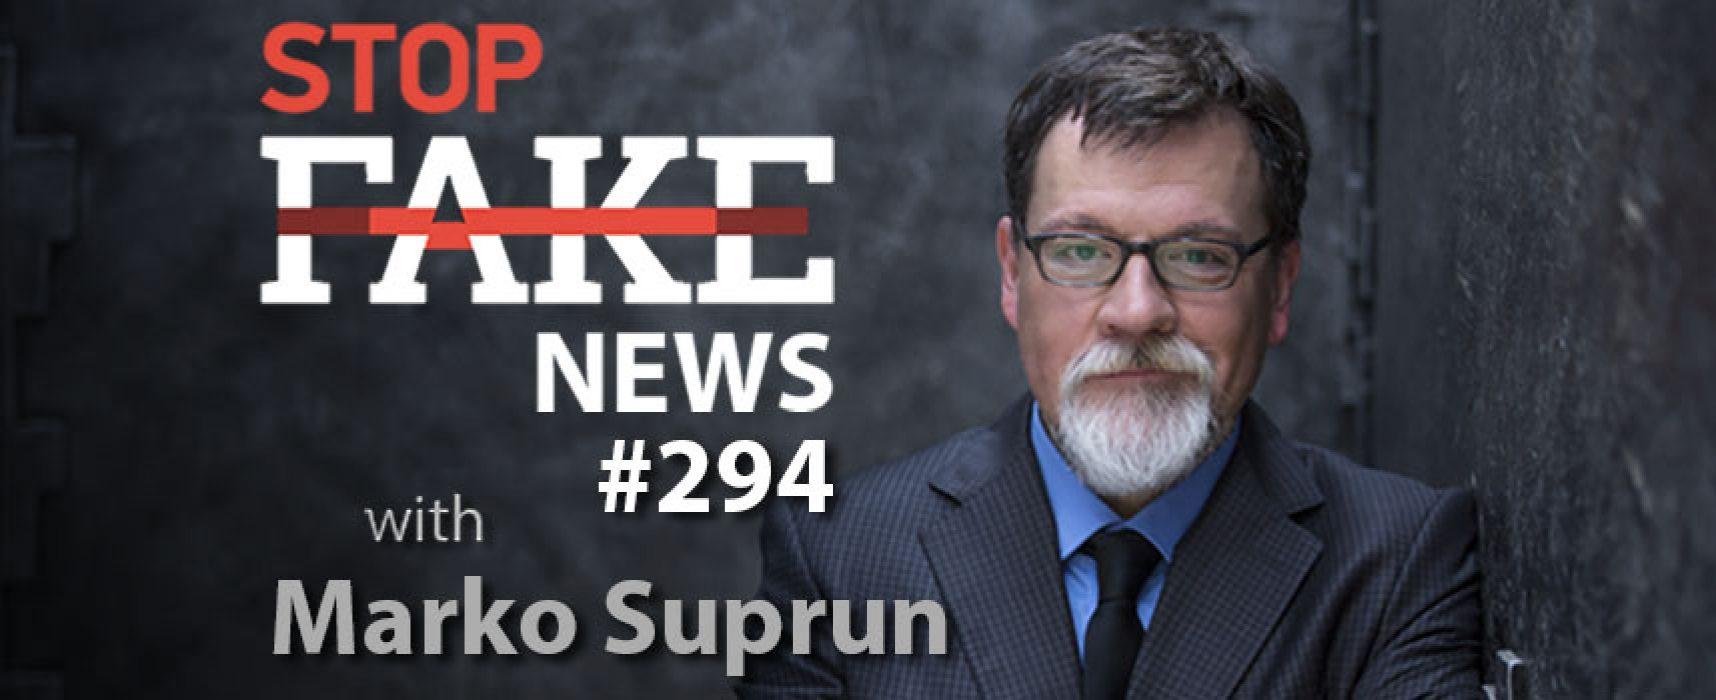 American Mercenary Killed in Ukraine: StopFakeNews with Marko Suprun (No. 294)